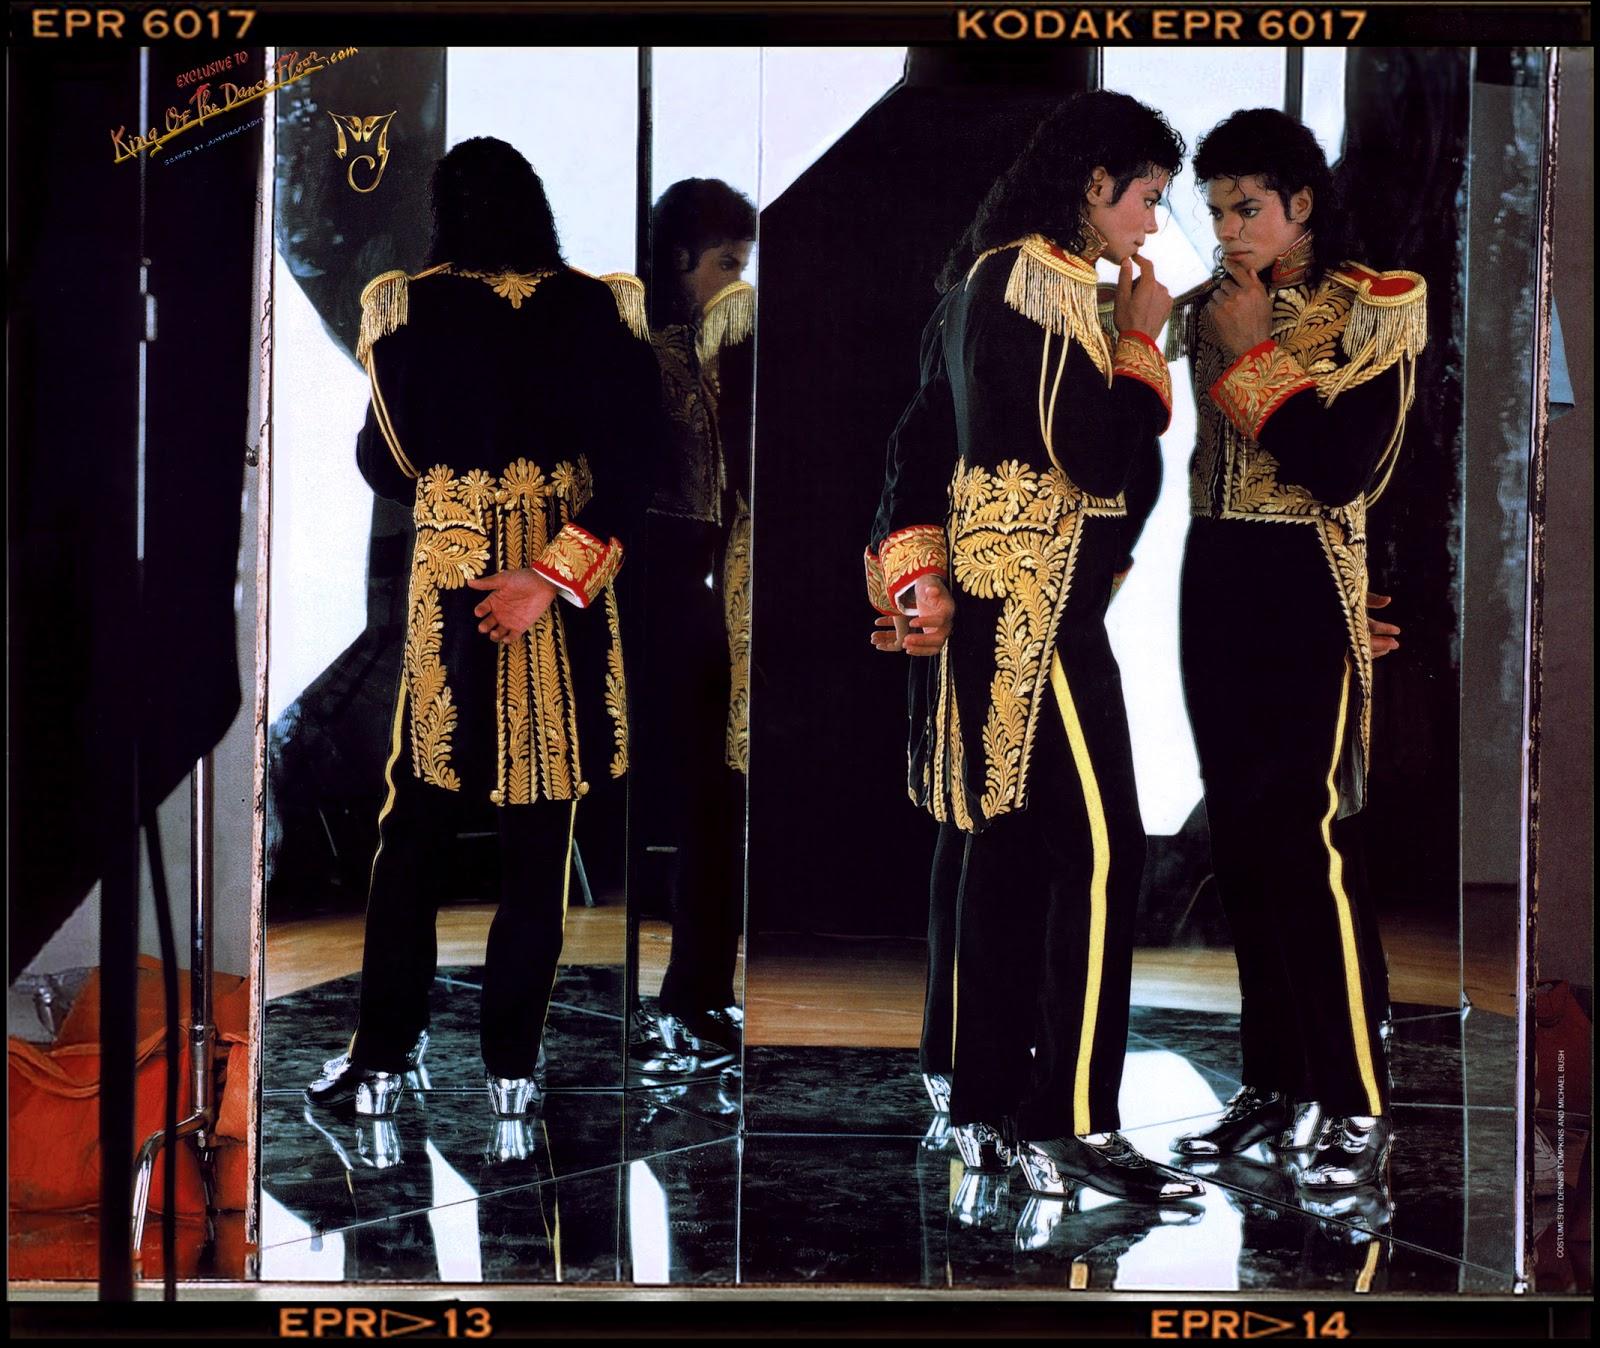 http://4.bp.blogspot.com/-XDqusKC4eB4/UM8N94r79jI/AAAAAAAAD14/YDJihg6_l8I/s1600/MichaelJackson-by-Annie-Leibovitz-1989-Photoshoots-HQ.jpg